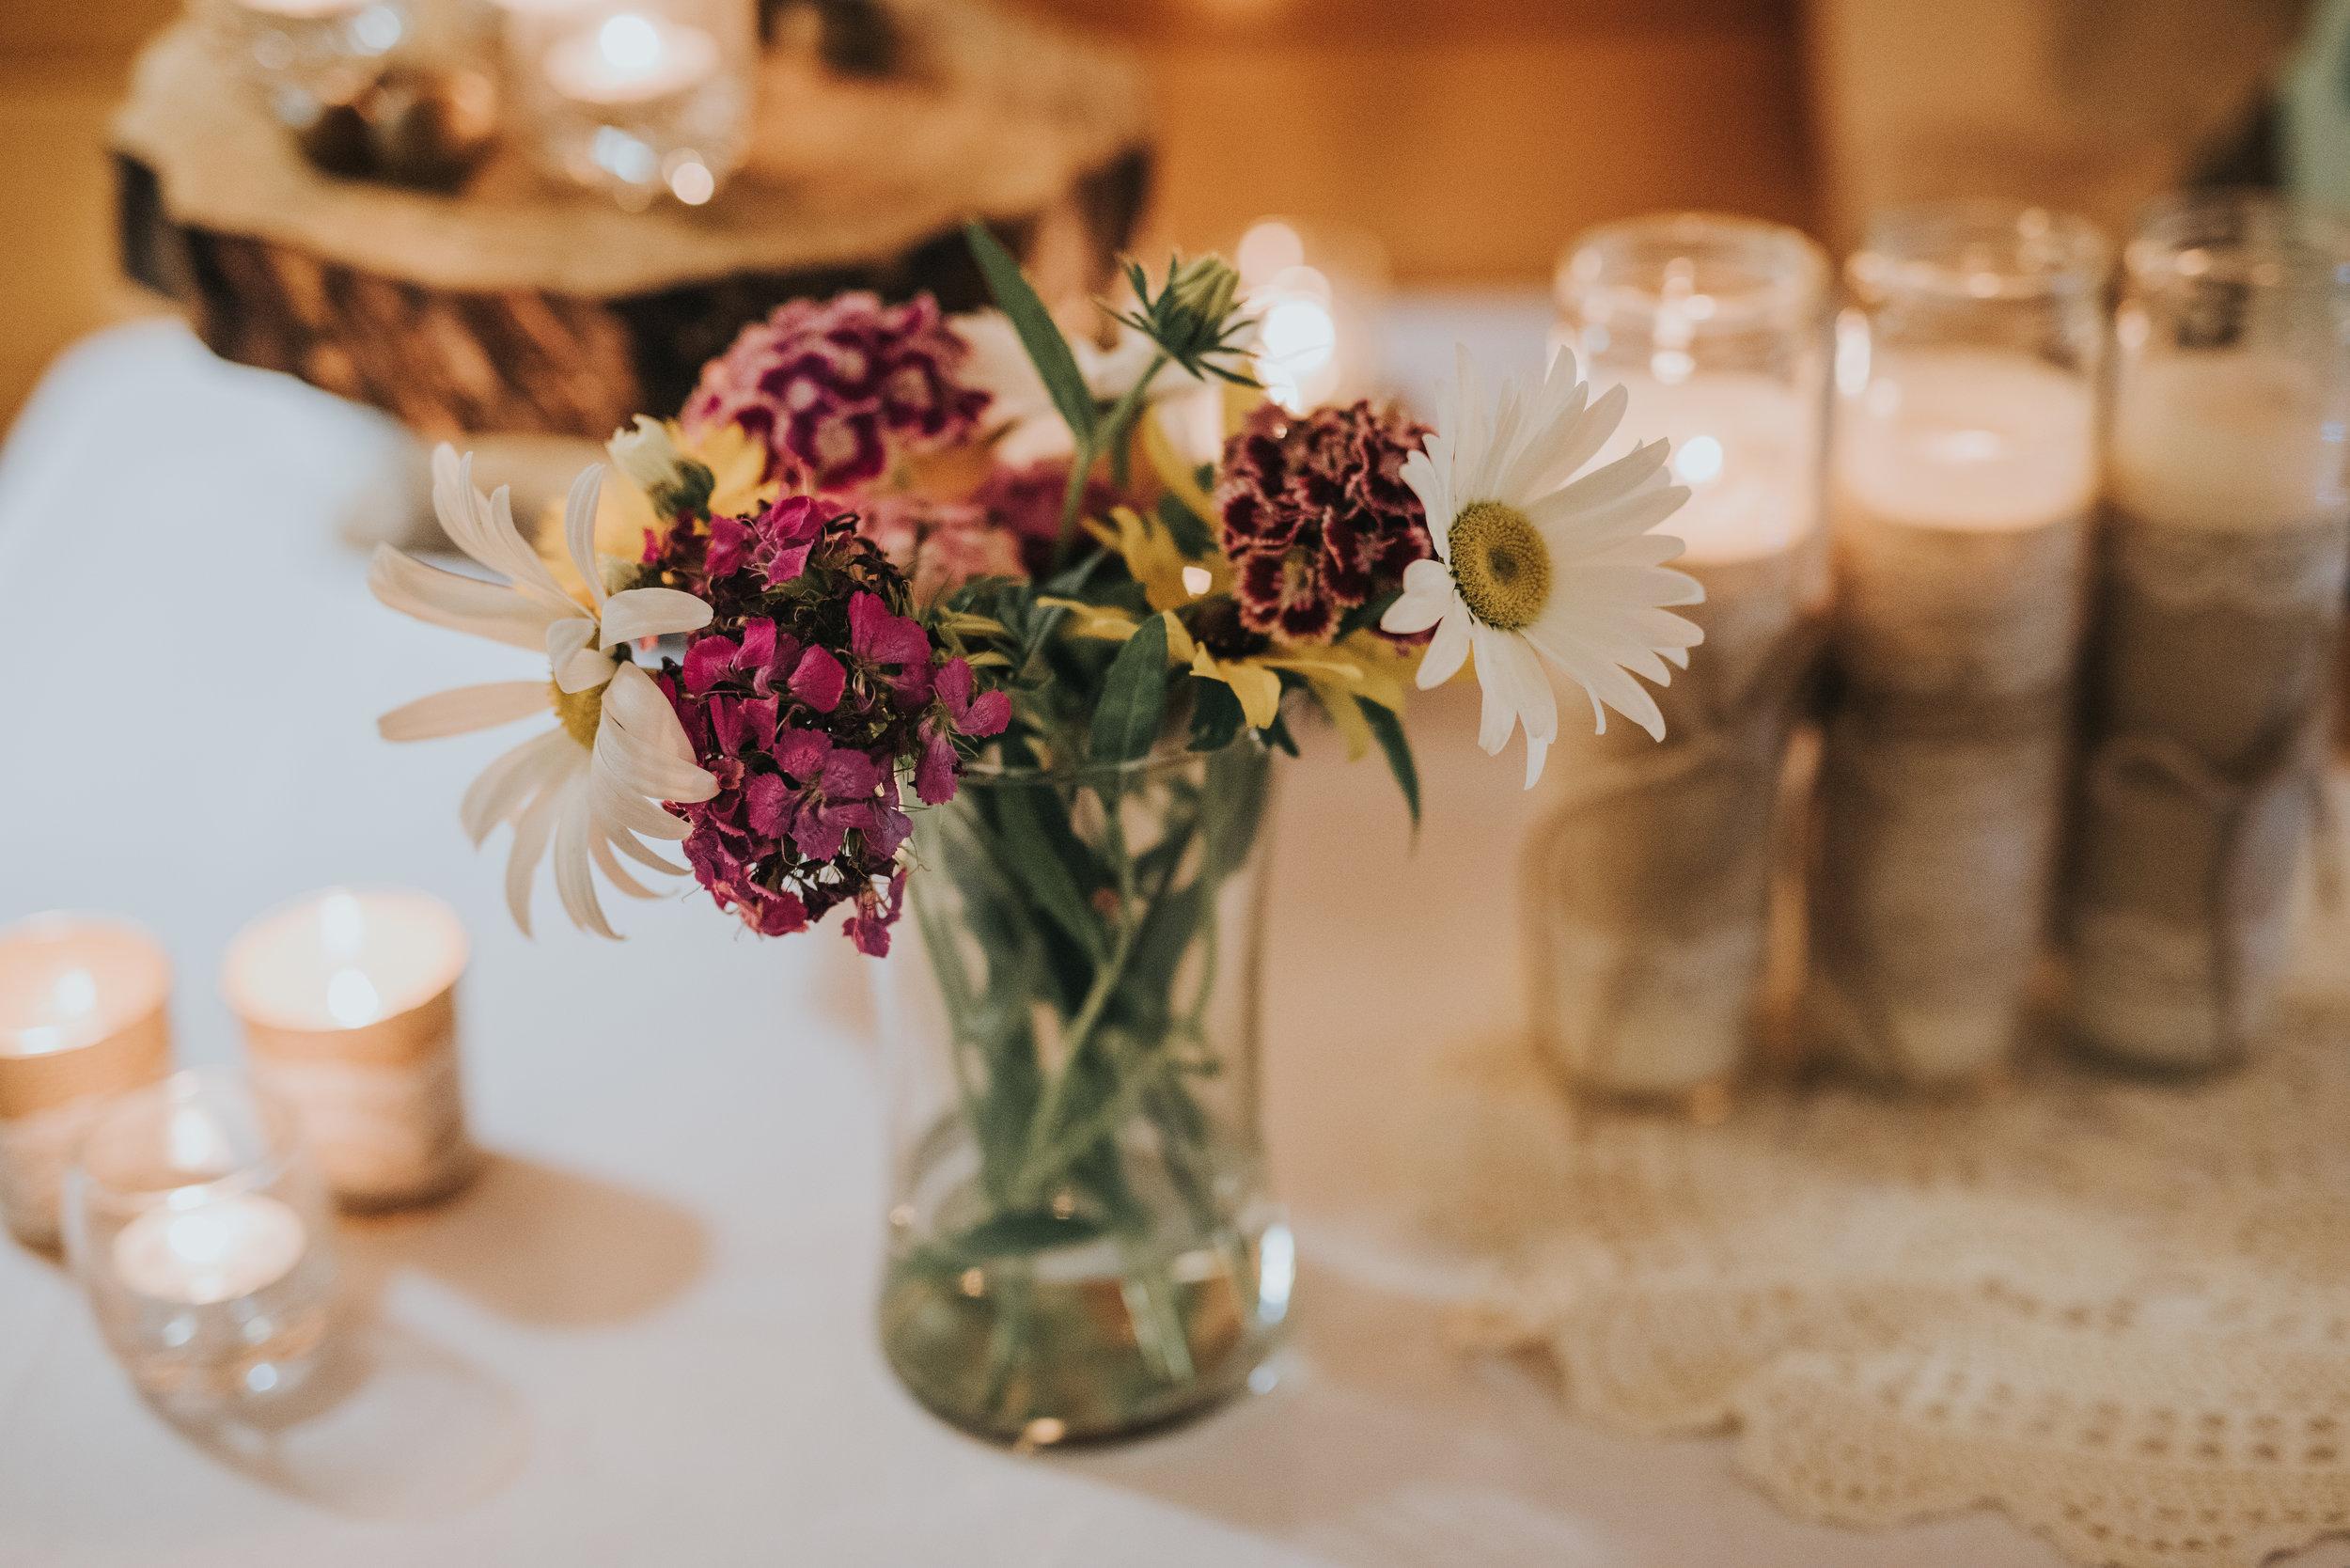 floral-rustic-cabin-wedding-decor-toronto-bohemian-boho-outdoor-summer-wedding-documentary-wedding-photography-by-willow-birch-photo.jpg